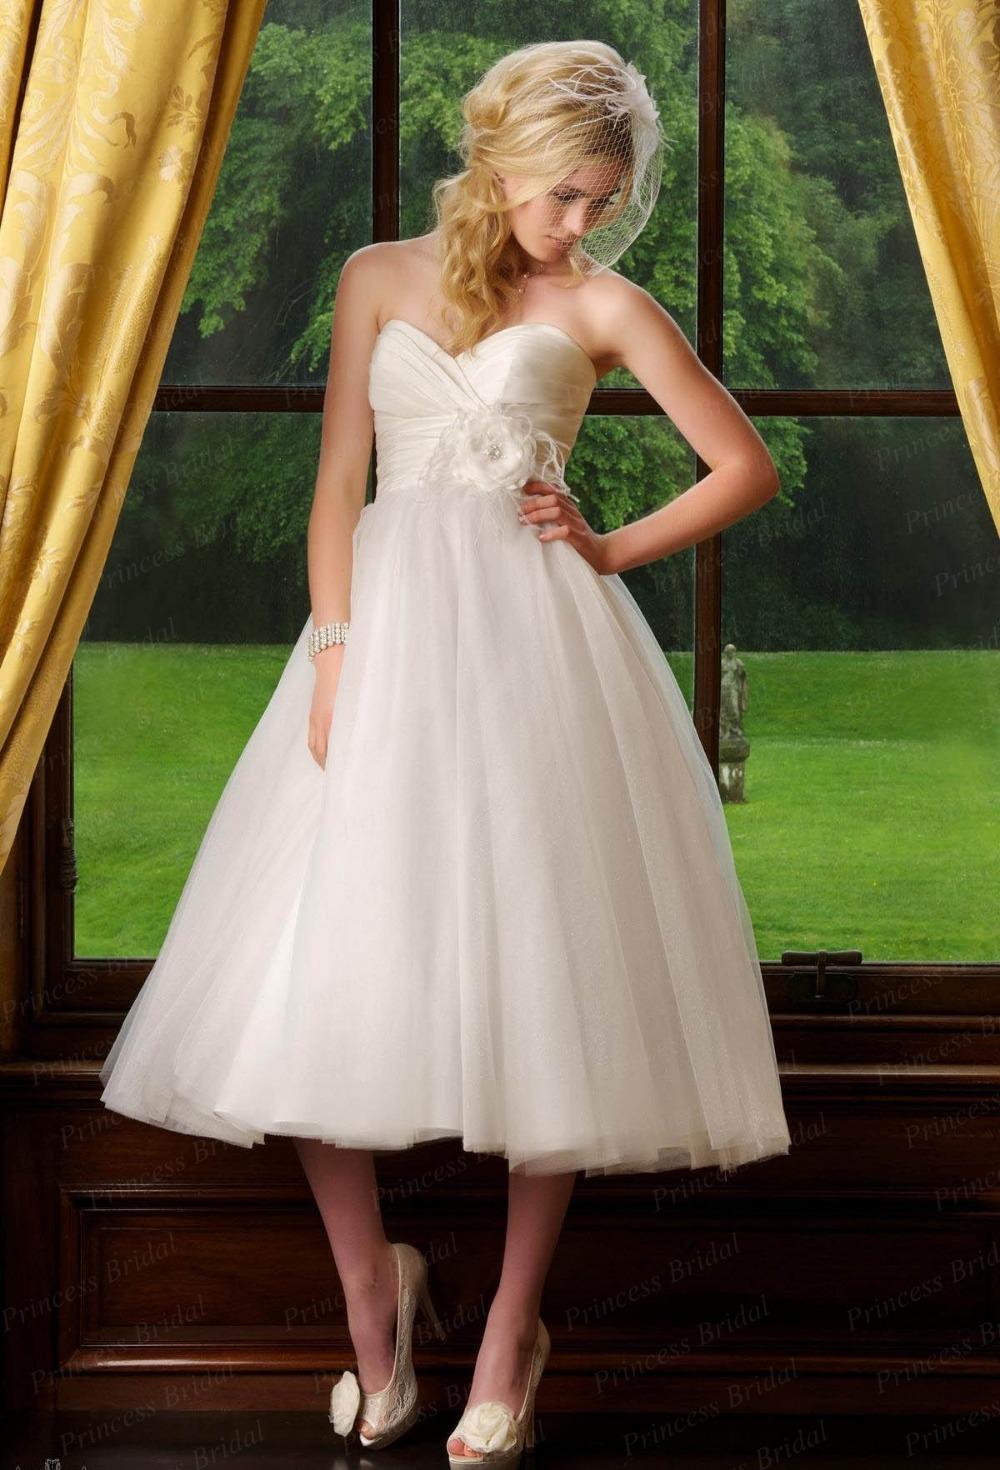 Wedding Dresses Under 100 : Simple wedding dresses under bells